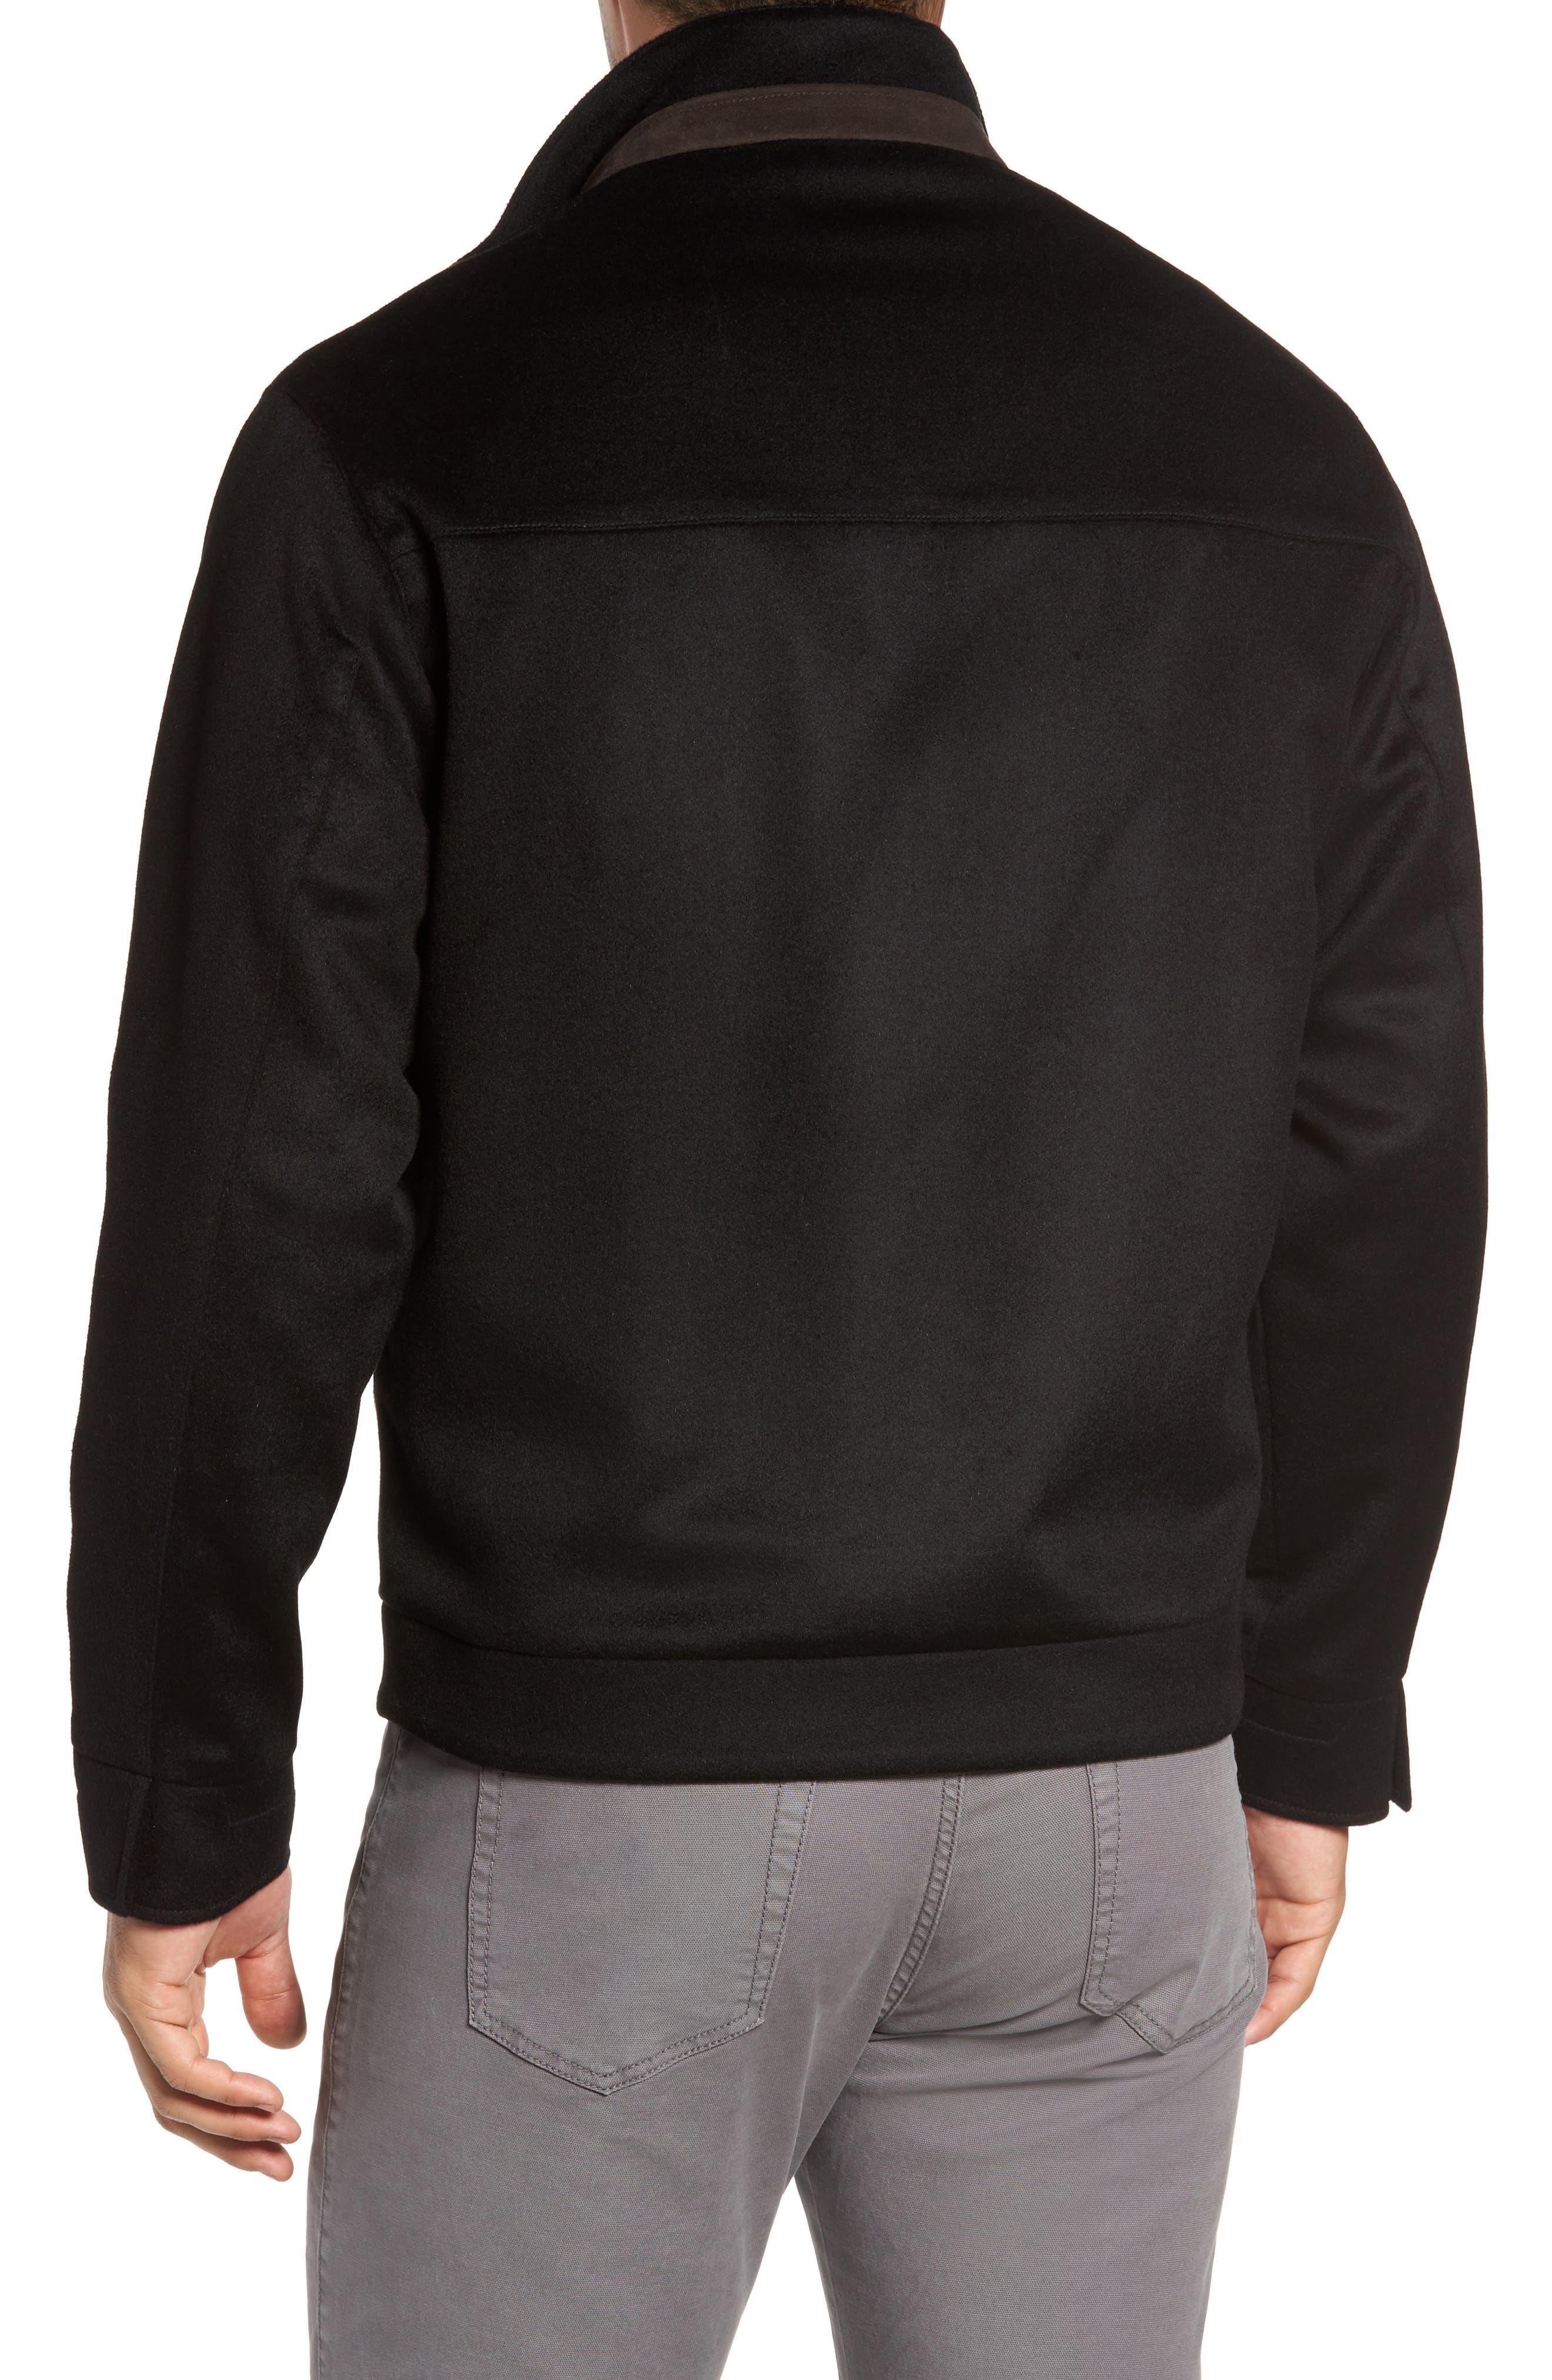 Westport Wool & Cashmere Jacket,                             Alternate thumbnail 4, color,